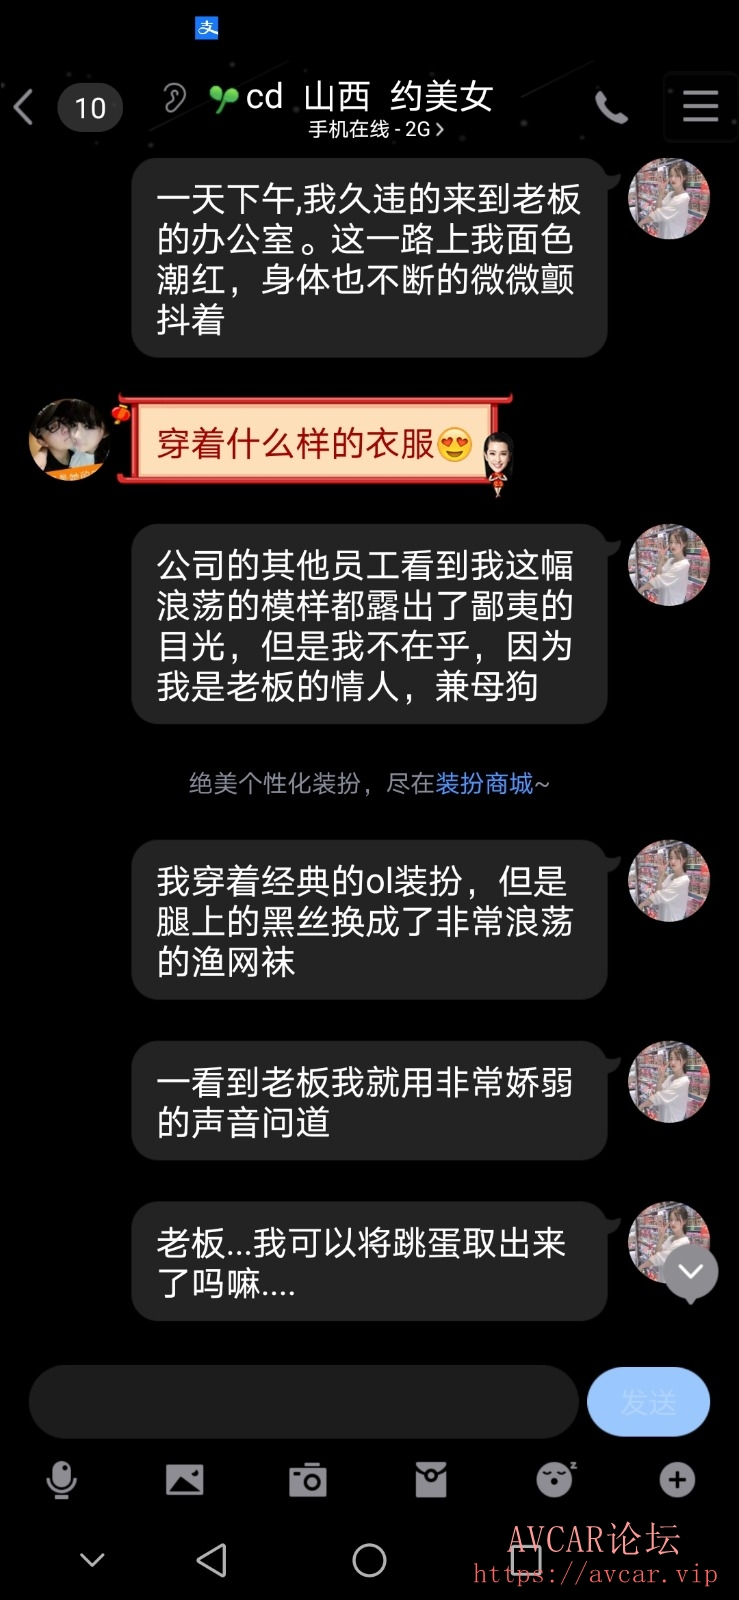 Screenshot_20210610_151155_com.tencent.mobileqq.jpg